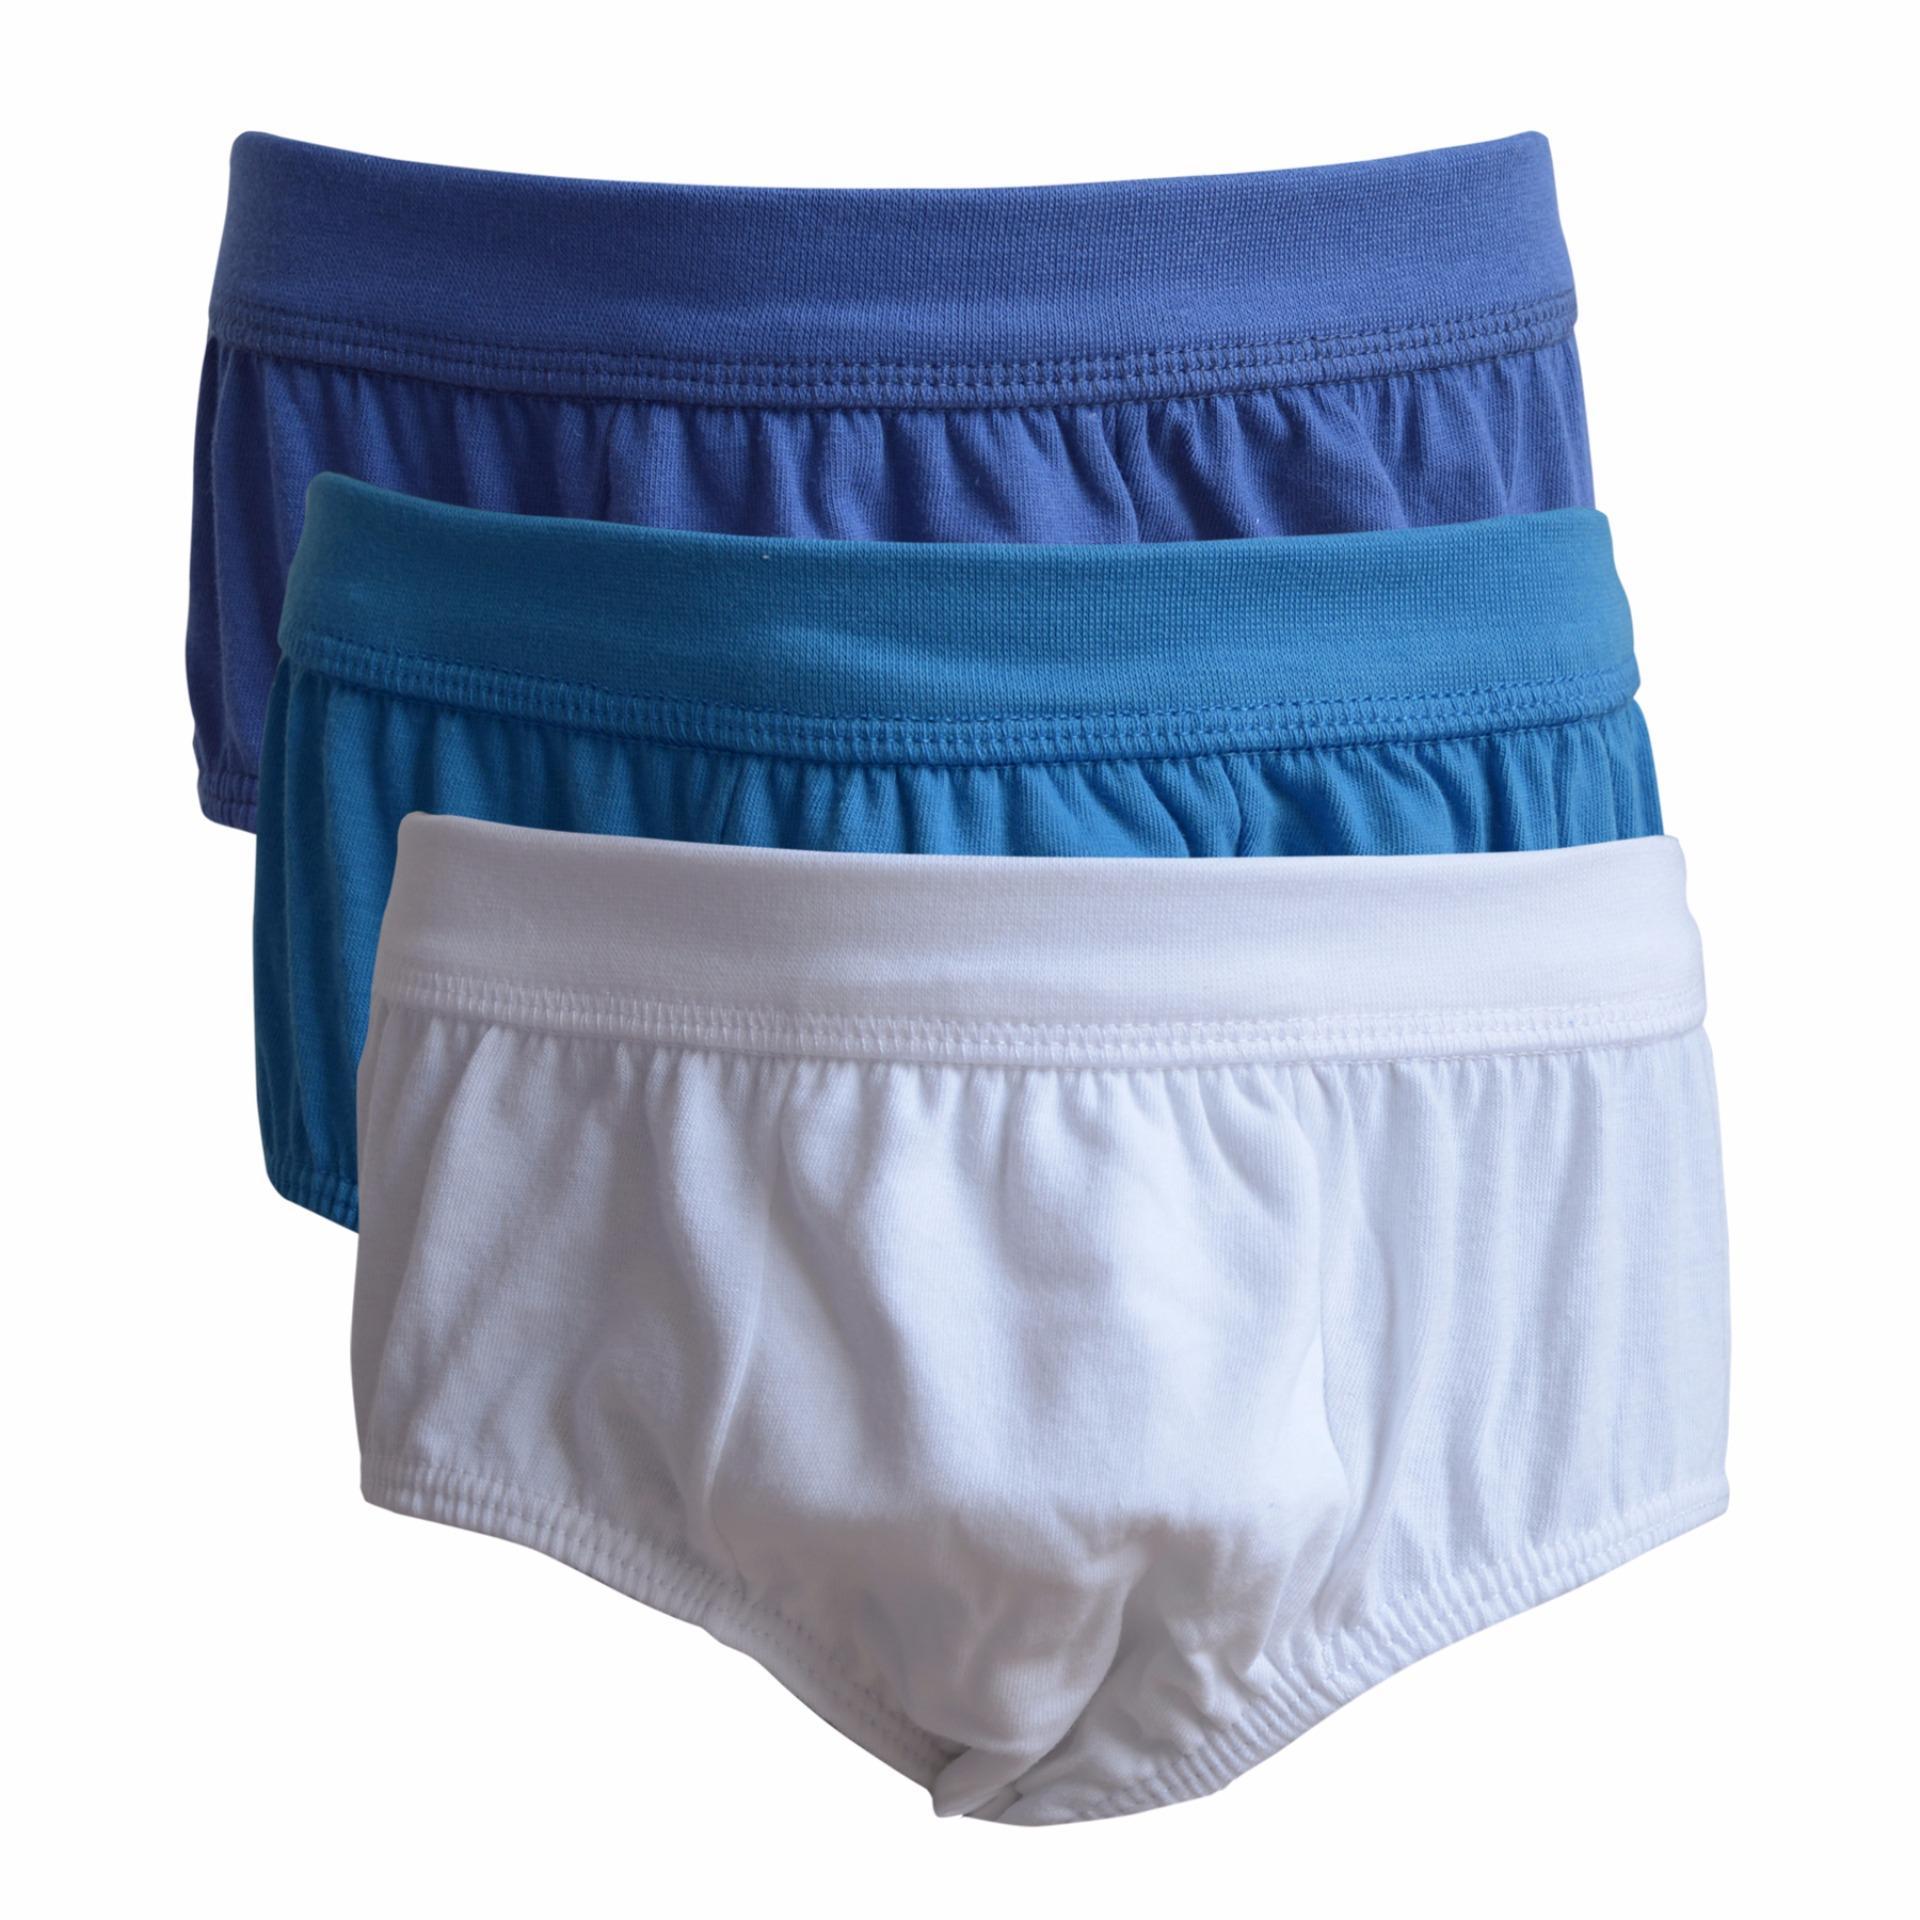 Fashion Pakaian Dalam Anak Laki Celana Pria Agree Original Isi 3 Pcs Rider Kids R210bb Model Briefs Multicolor